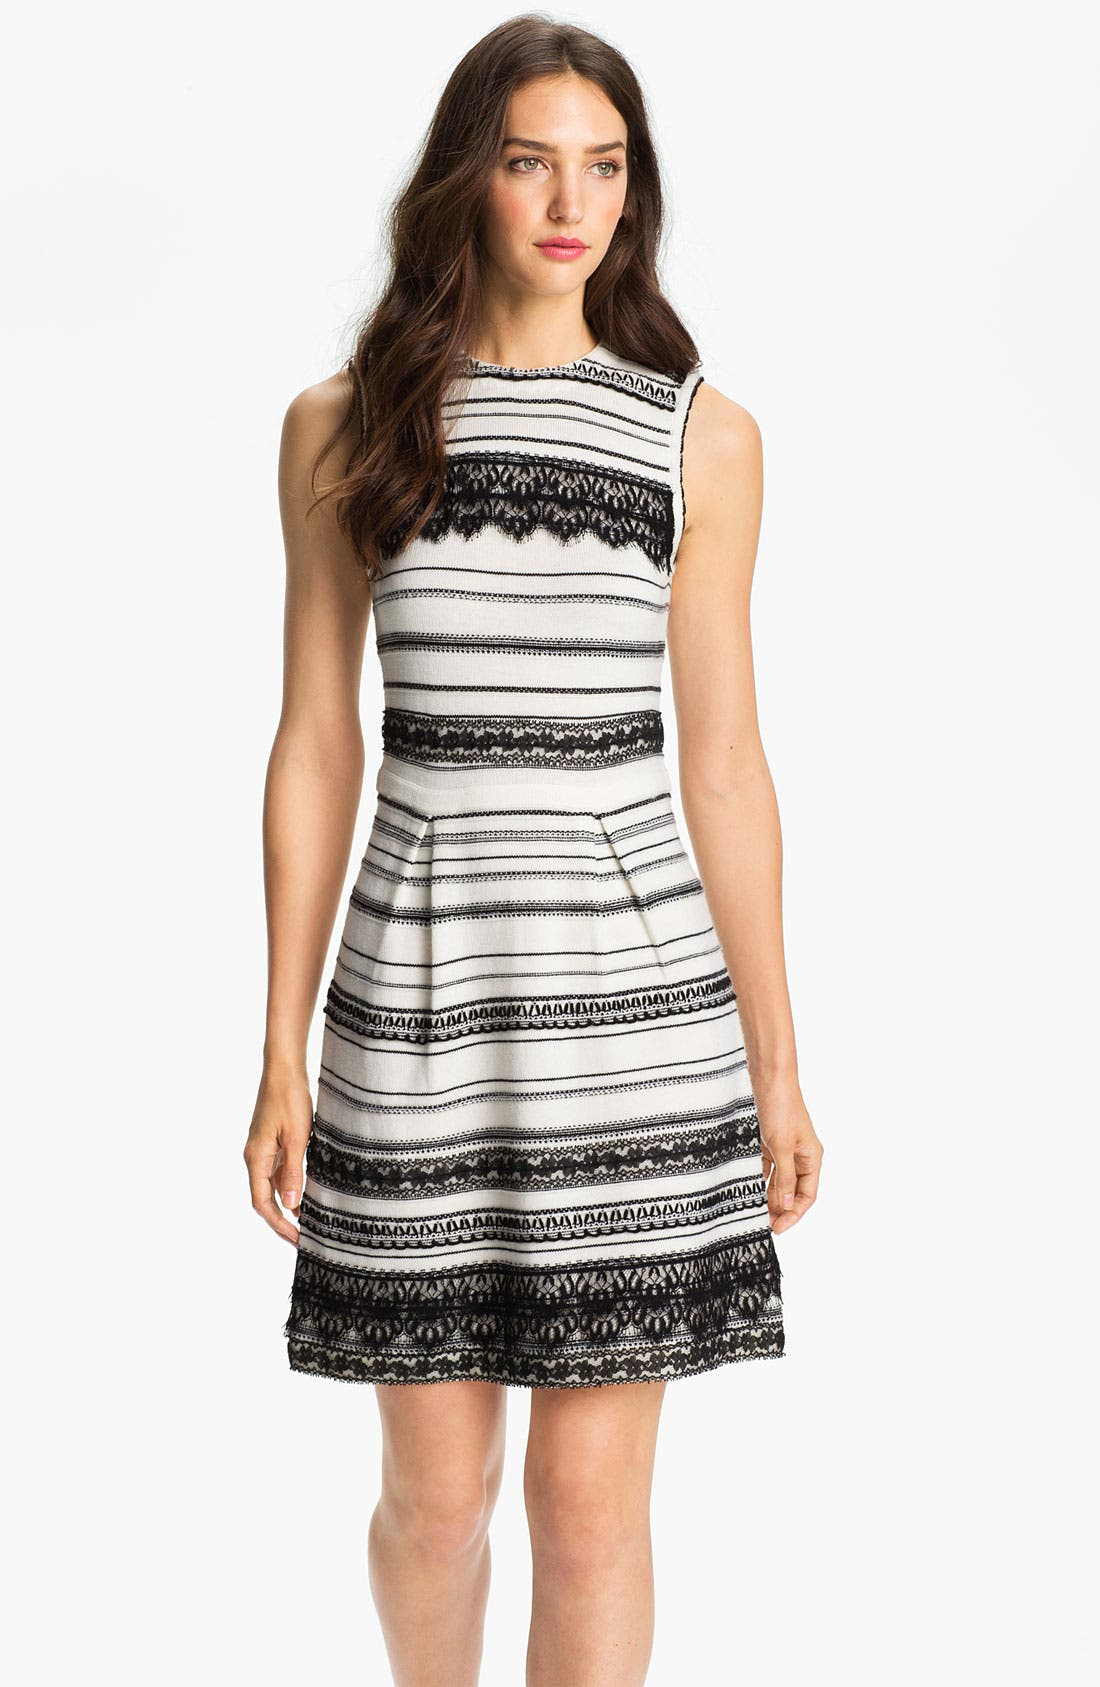 Alternate Image 1 Selected - Nanette Lepore 'Peace & Soul' Merino Wool Fit & Flare Dress